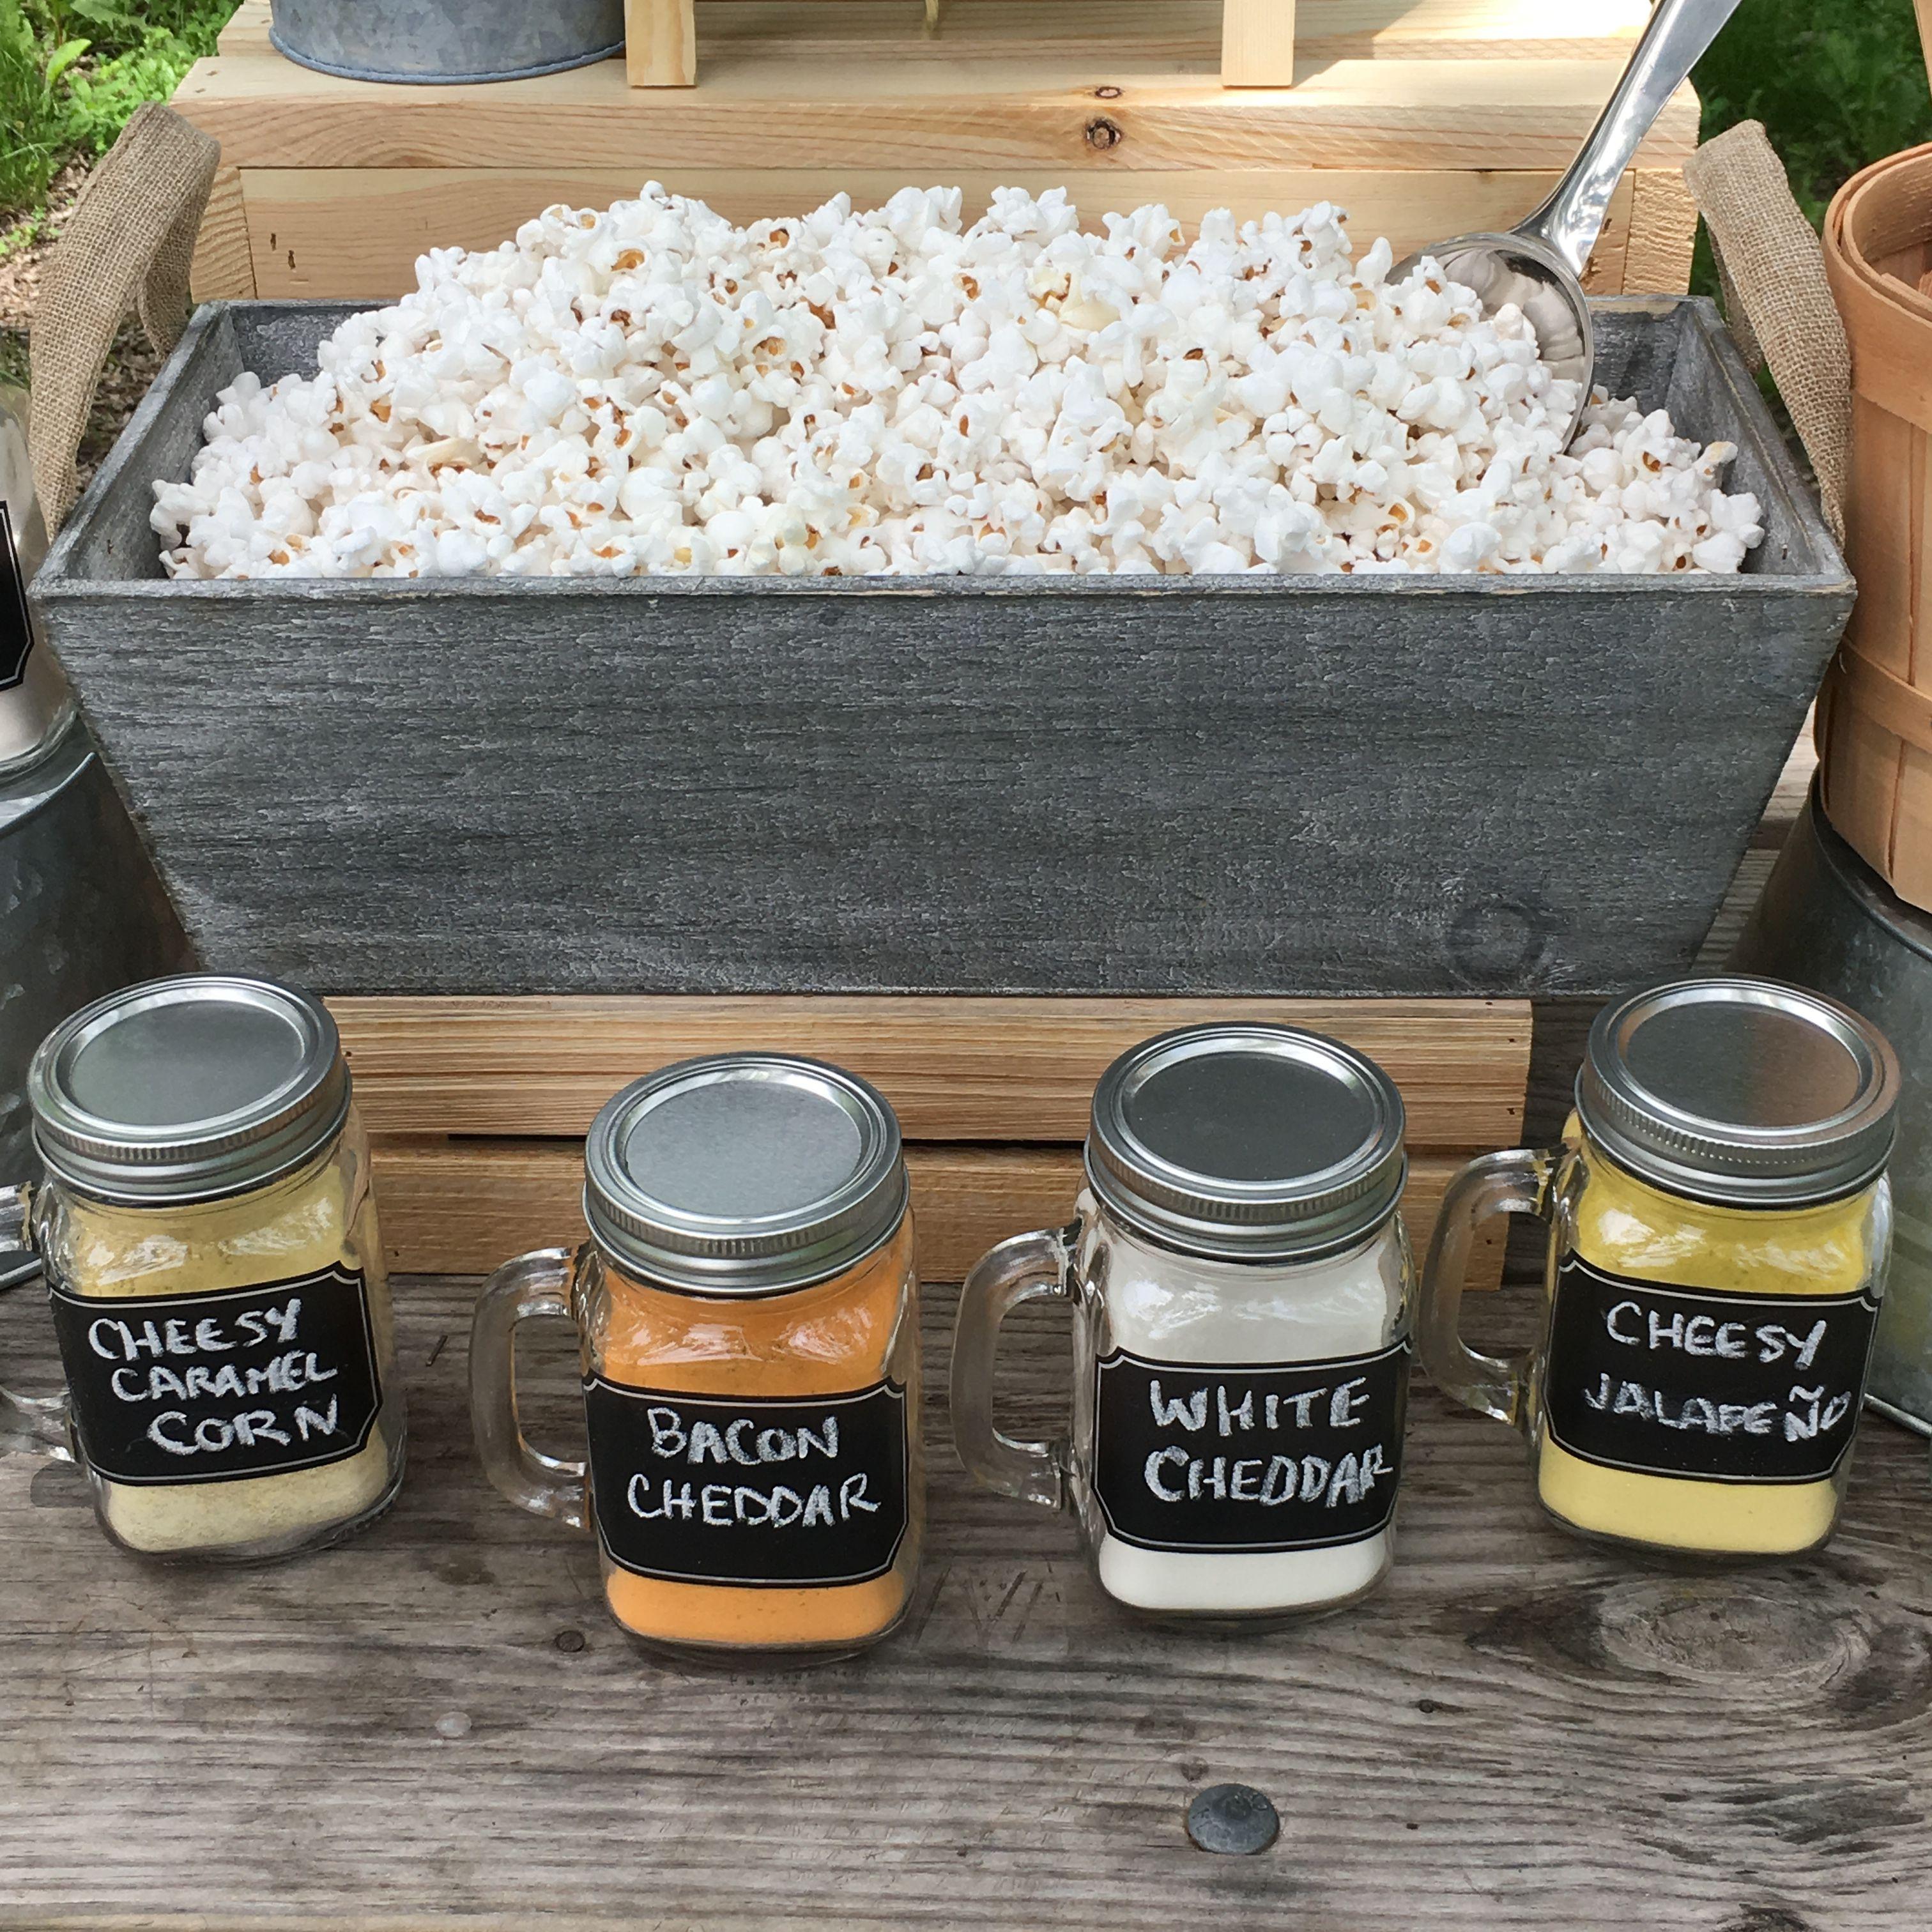 Wedding Snack Bar Ideas: How To Make A Killer DIY Popcorn Bar